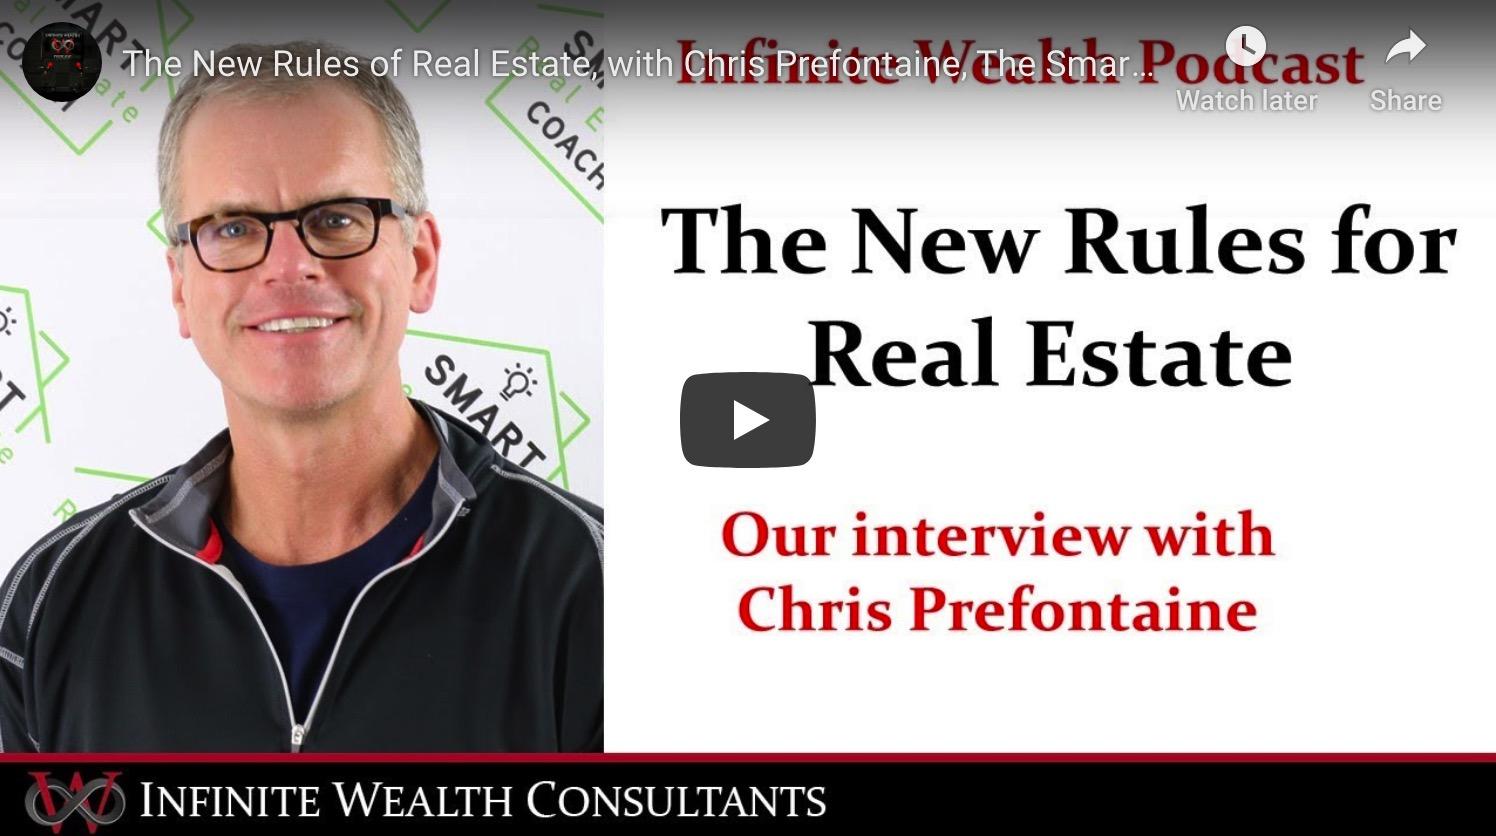 Chris Prefontaine Podcast